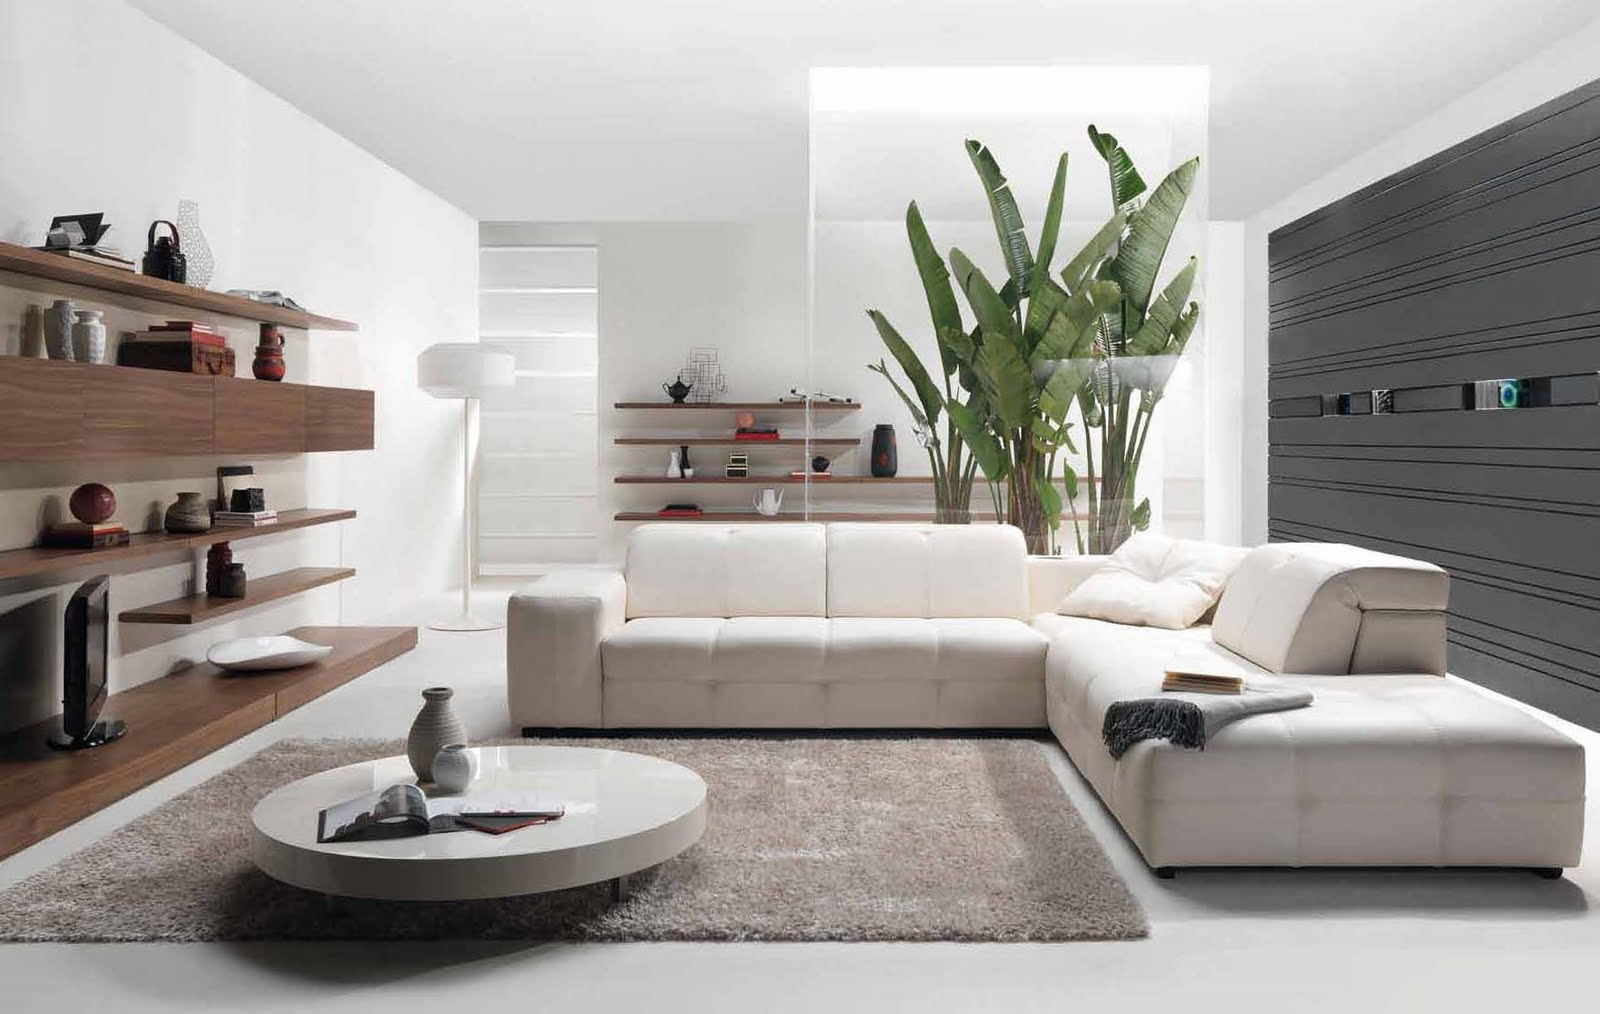 Future House Design Modern Living Room Interior Design Styles 2010 by Natuzzi